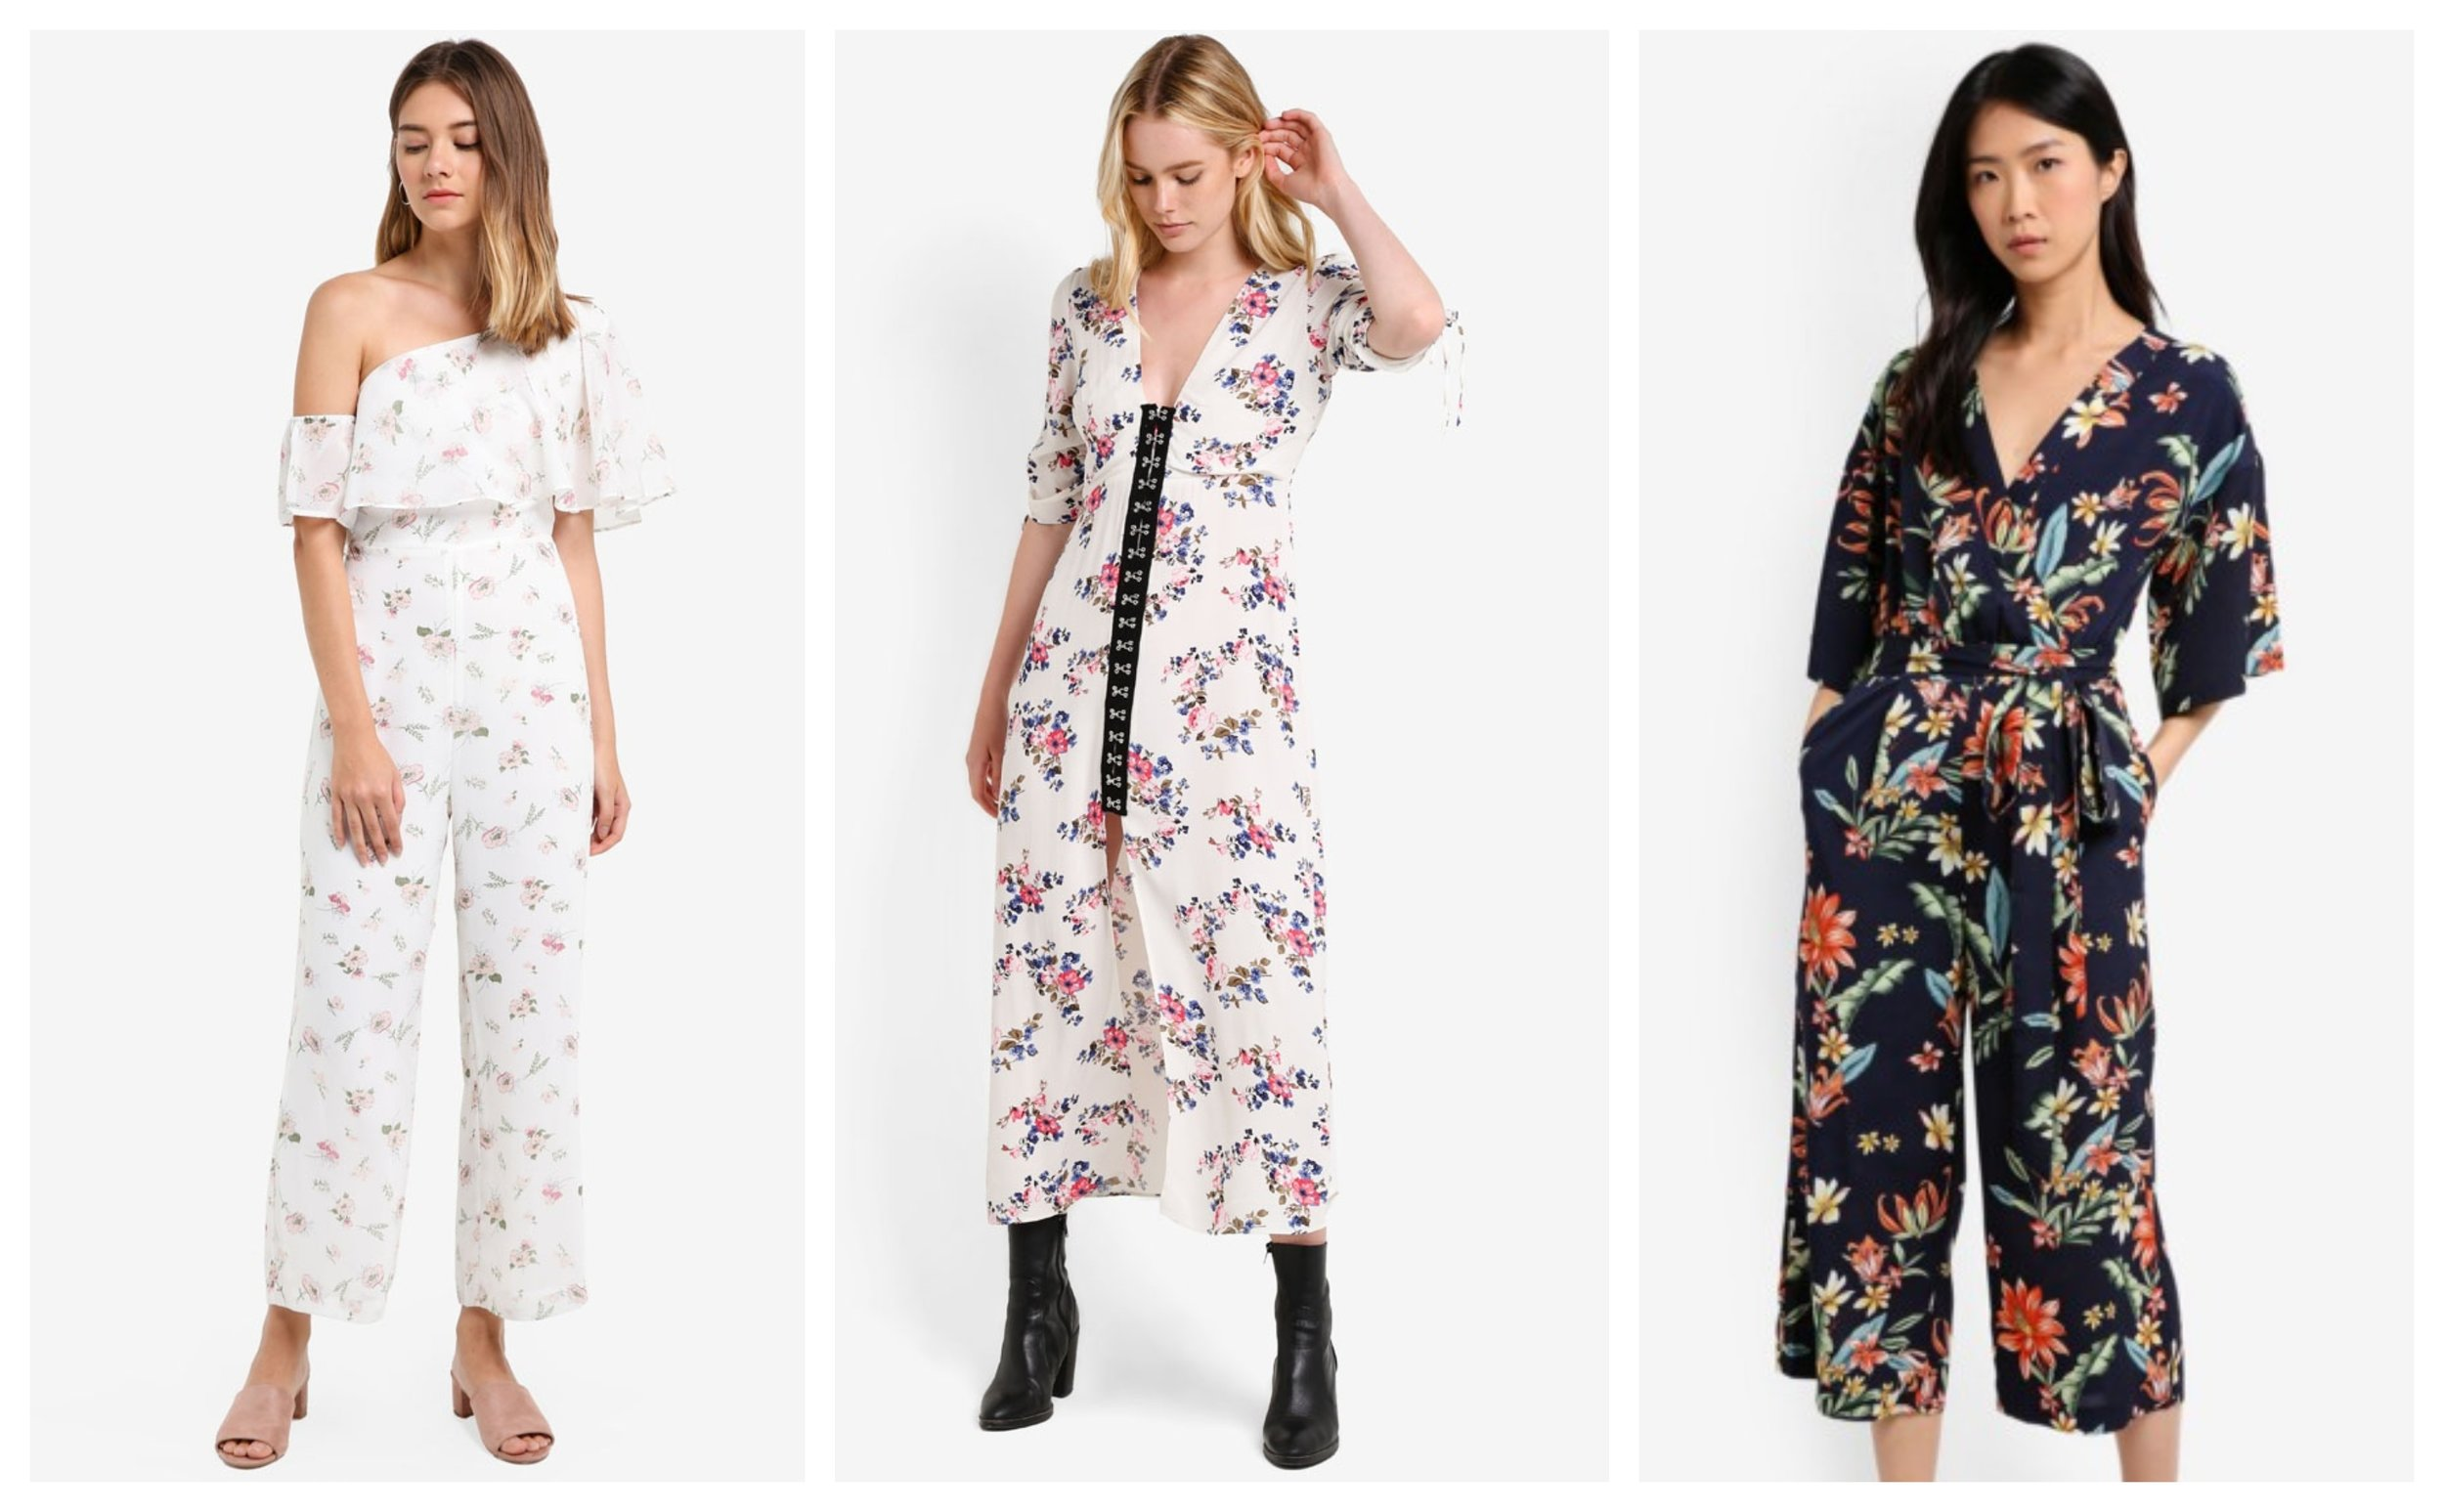 Preen & Proper Toga Floral Jumpsuit  |  Topshop Floral Hook & Eye Midi Dress  |  ZALORA Printed Wrapped Jumpsuit